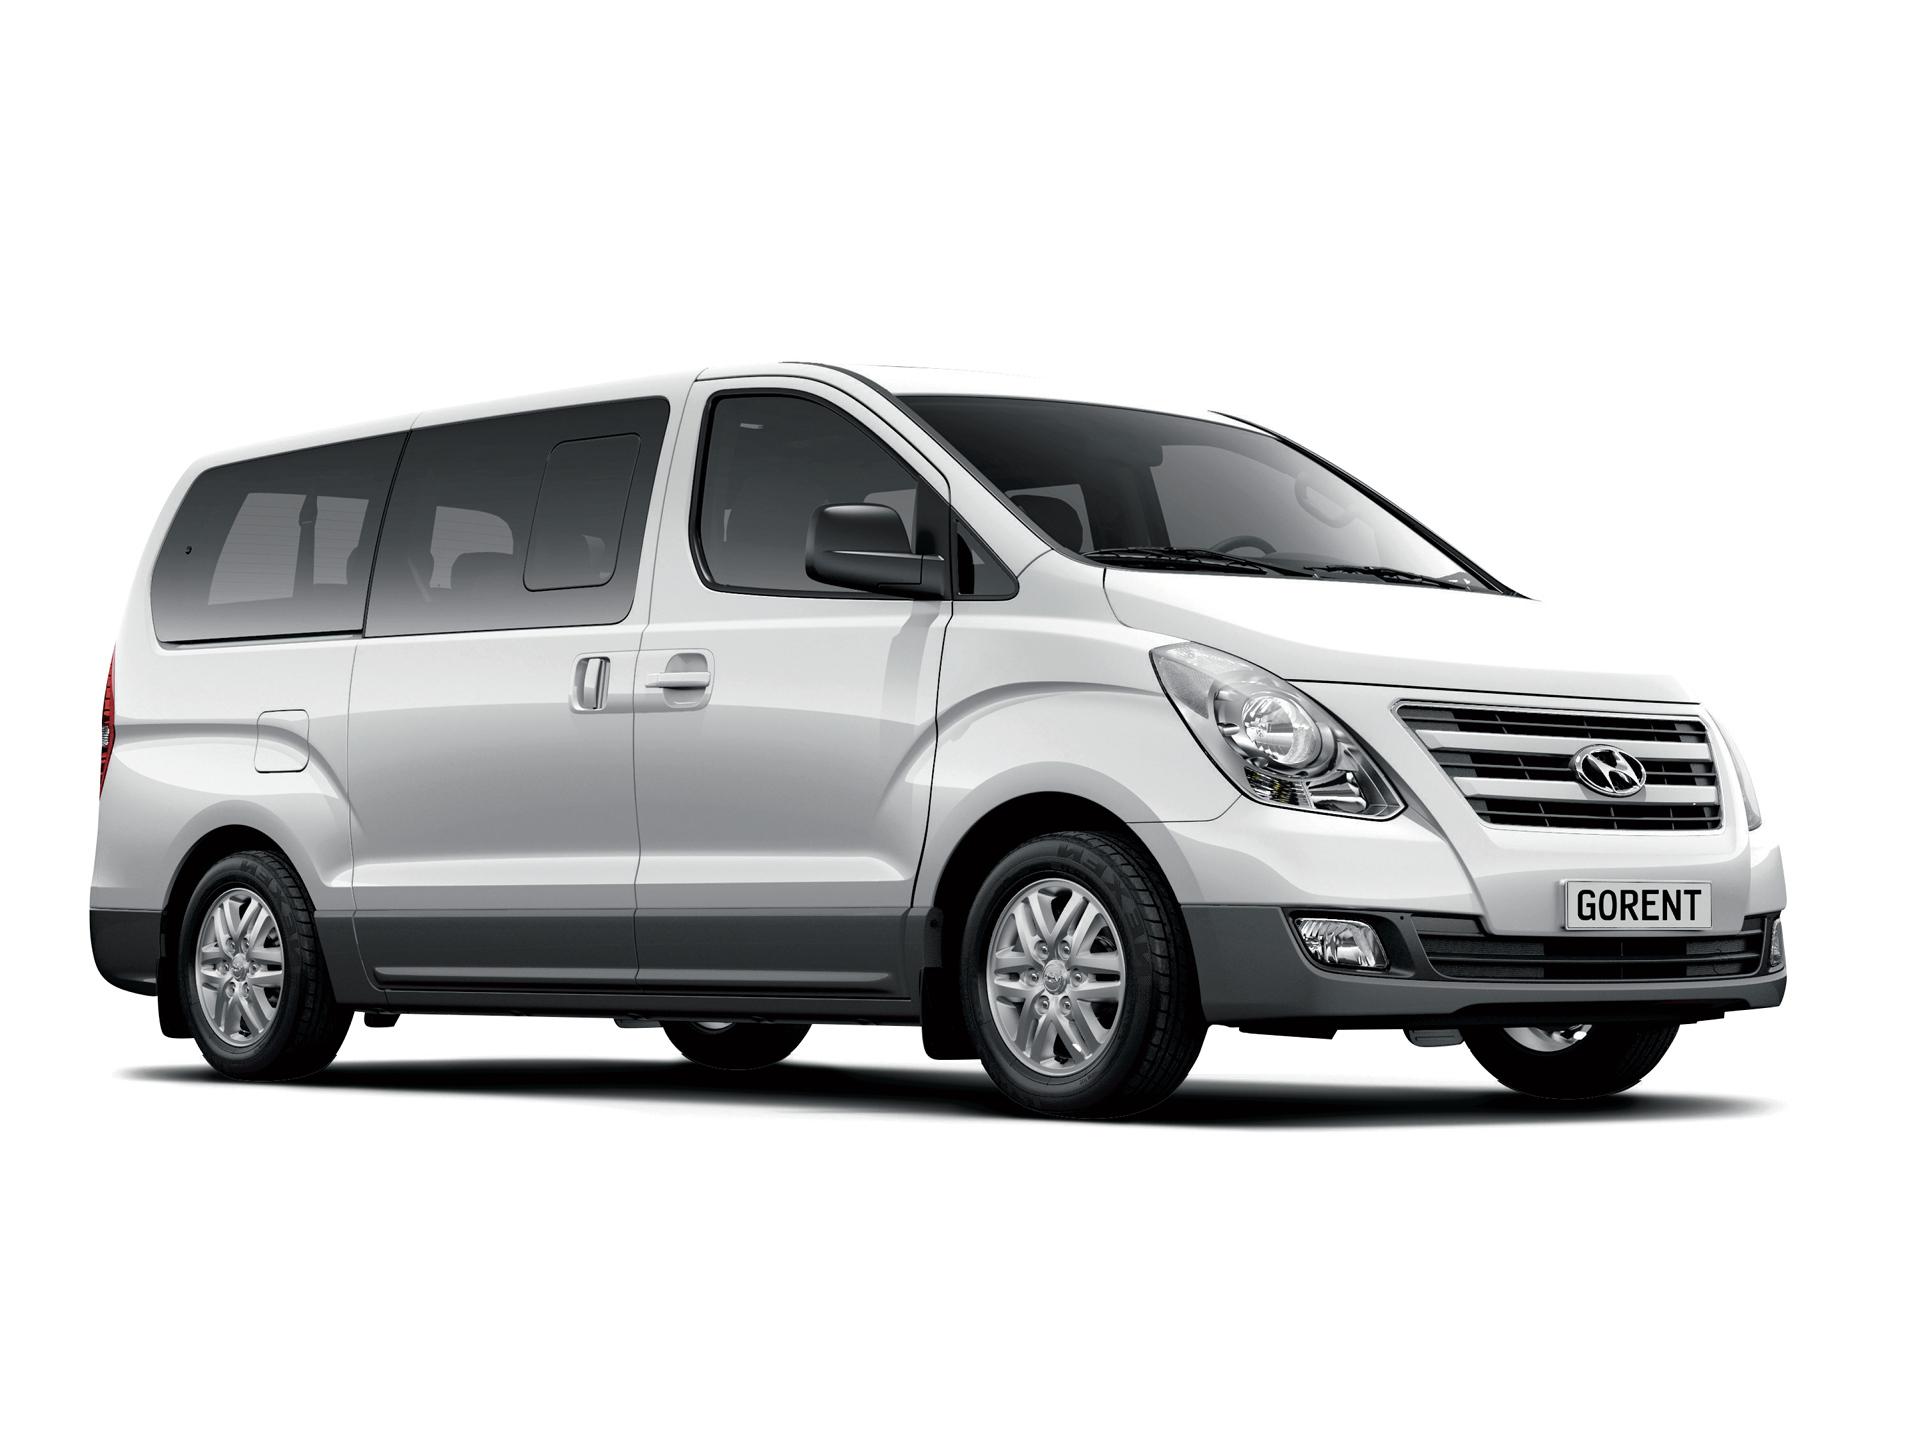 People Mover (Minivan), Hyundai iMax o.ä.